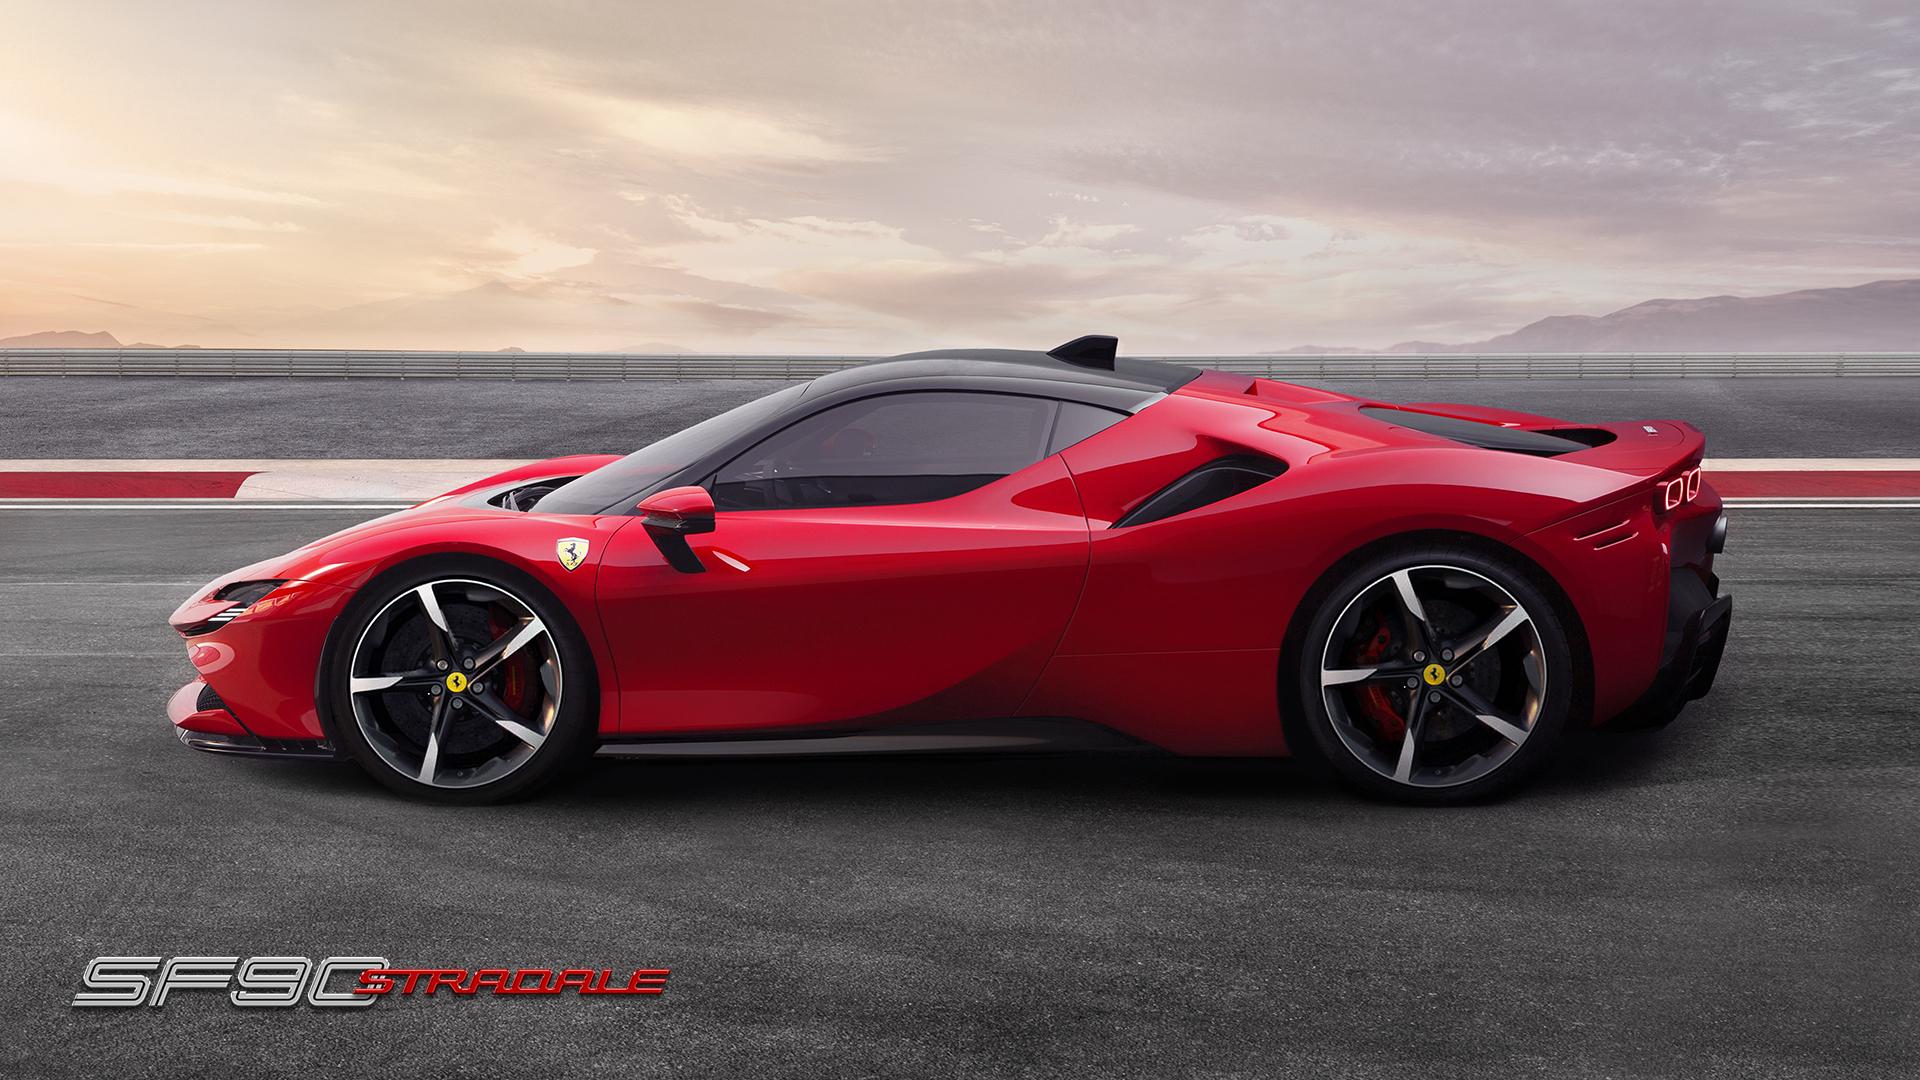 190162-car-Ferrari-SF90-Stradale.jpg